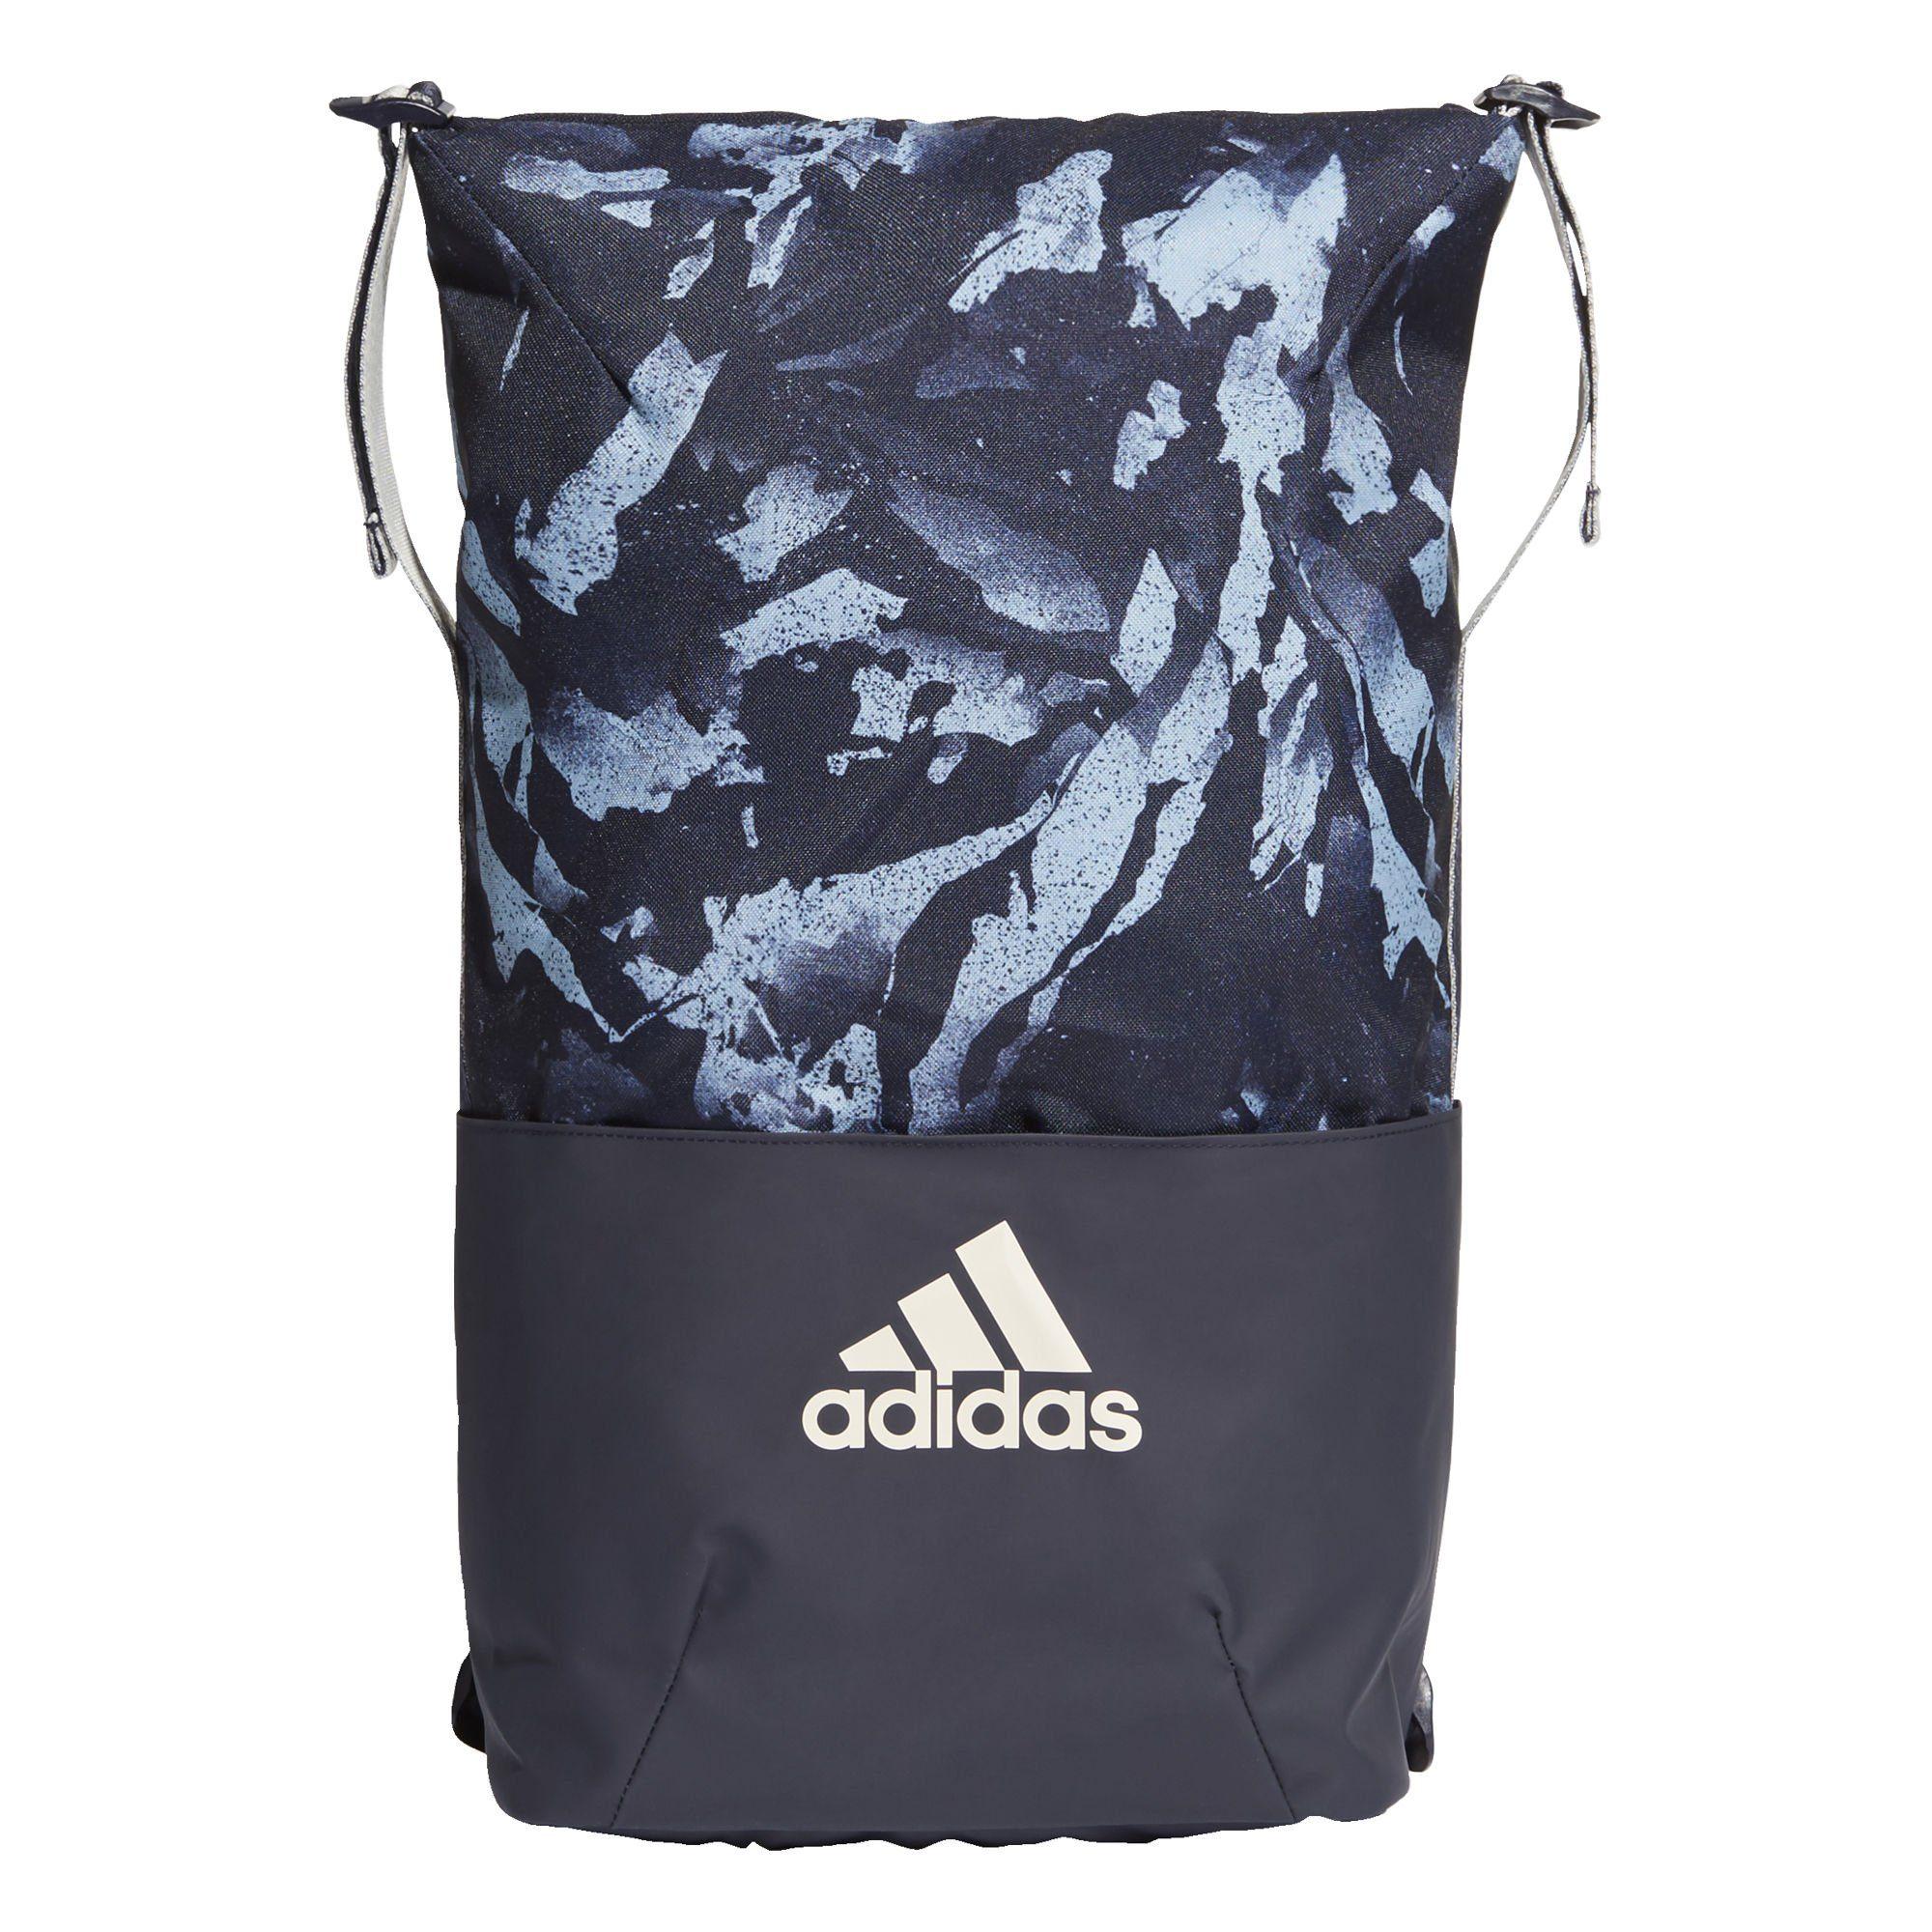 adidas Performance Daypack »adidas Z.N.E. Core Graphic Rucksack«, ZNE online kaufen | OTTO